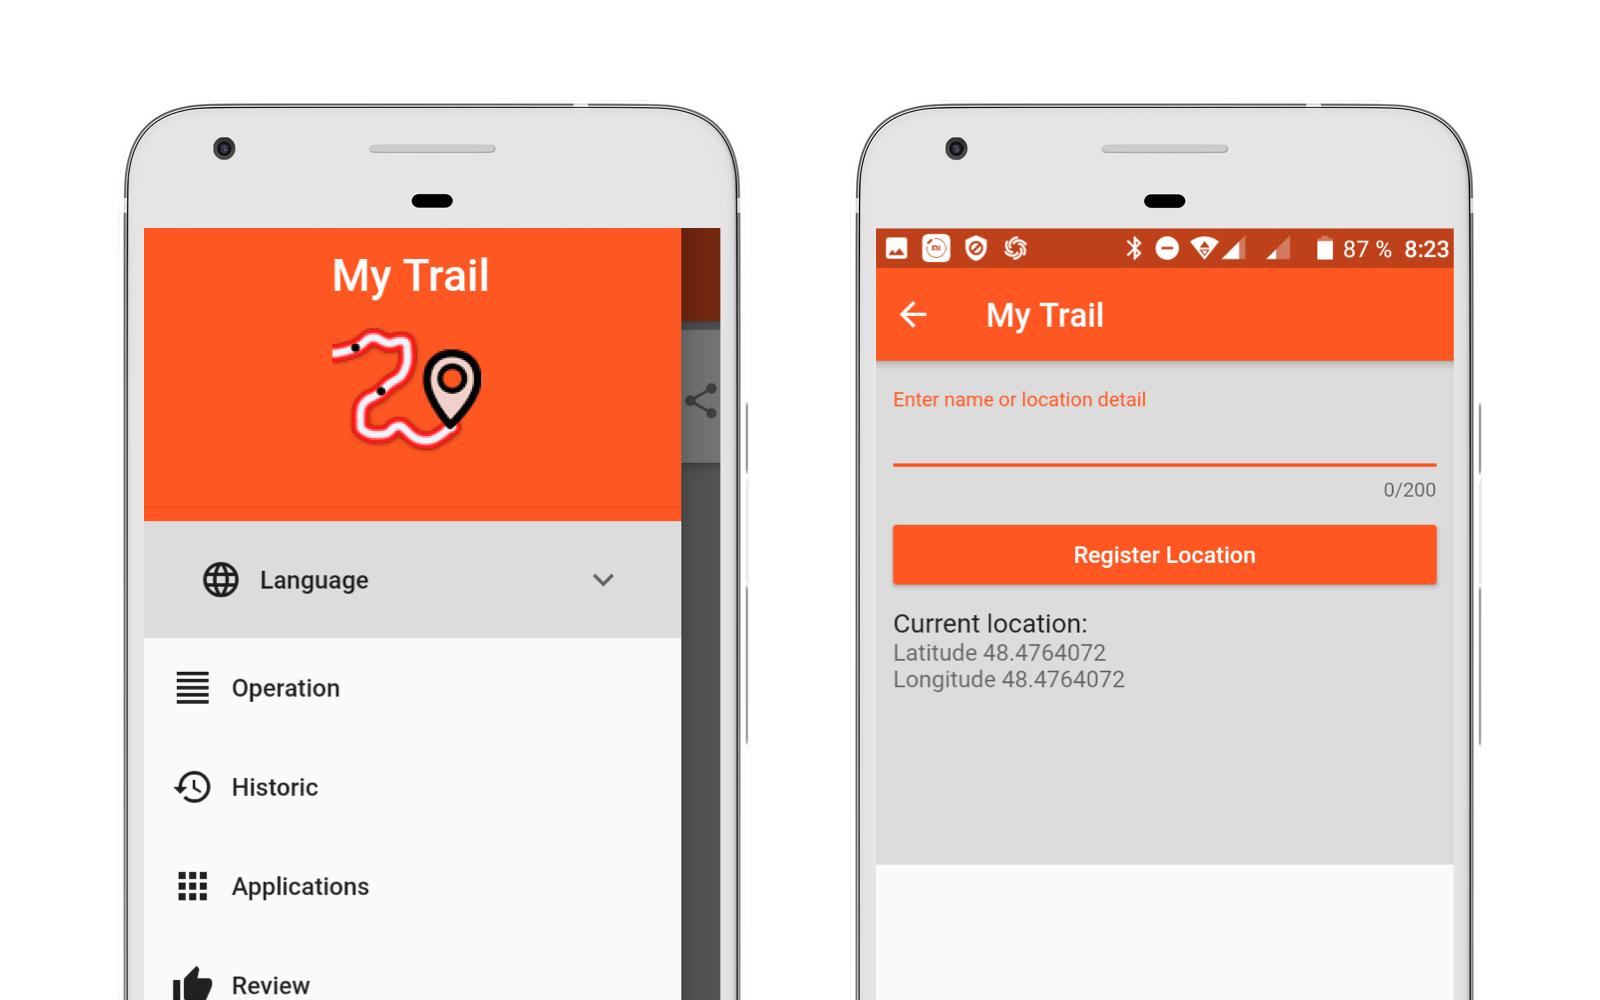 My Trail app